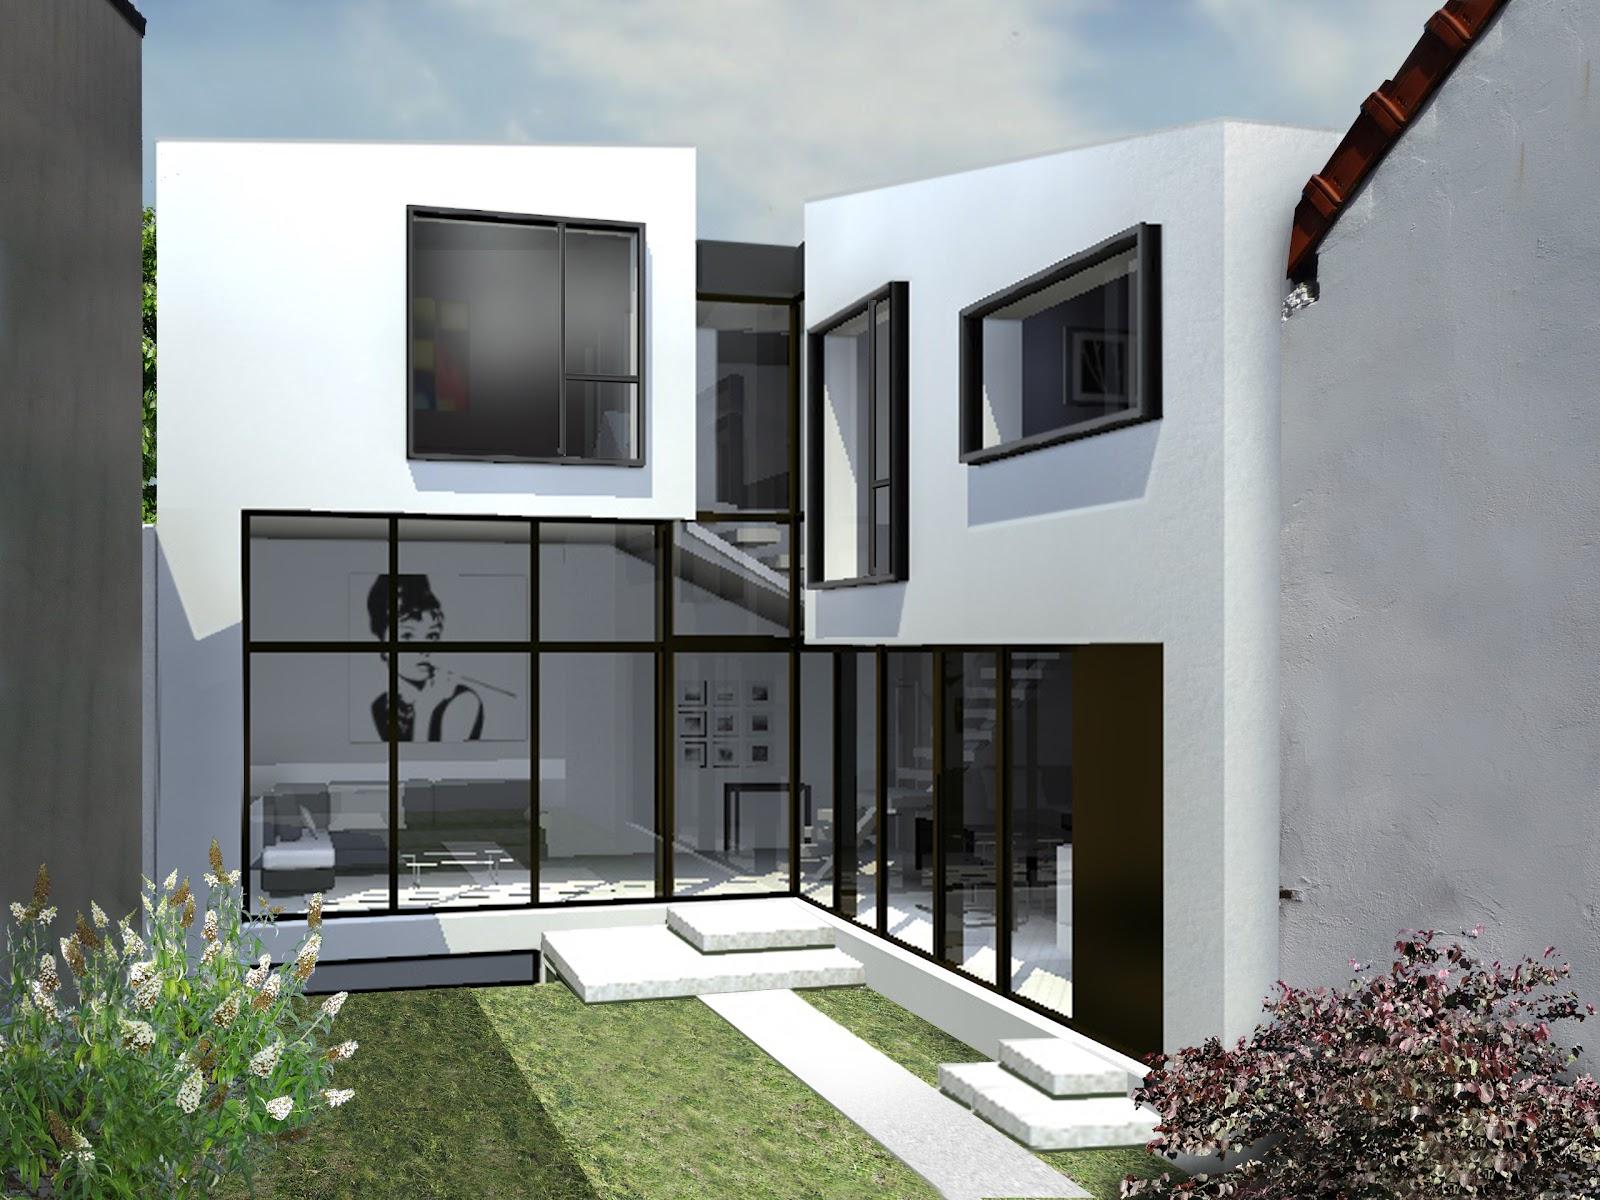 nim architecture avril 2012. Black Bedroom Furniture Sets. Home Design Ideas